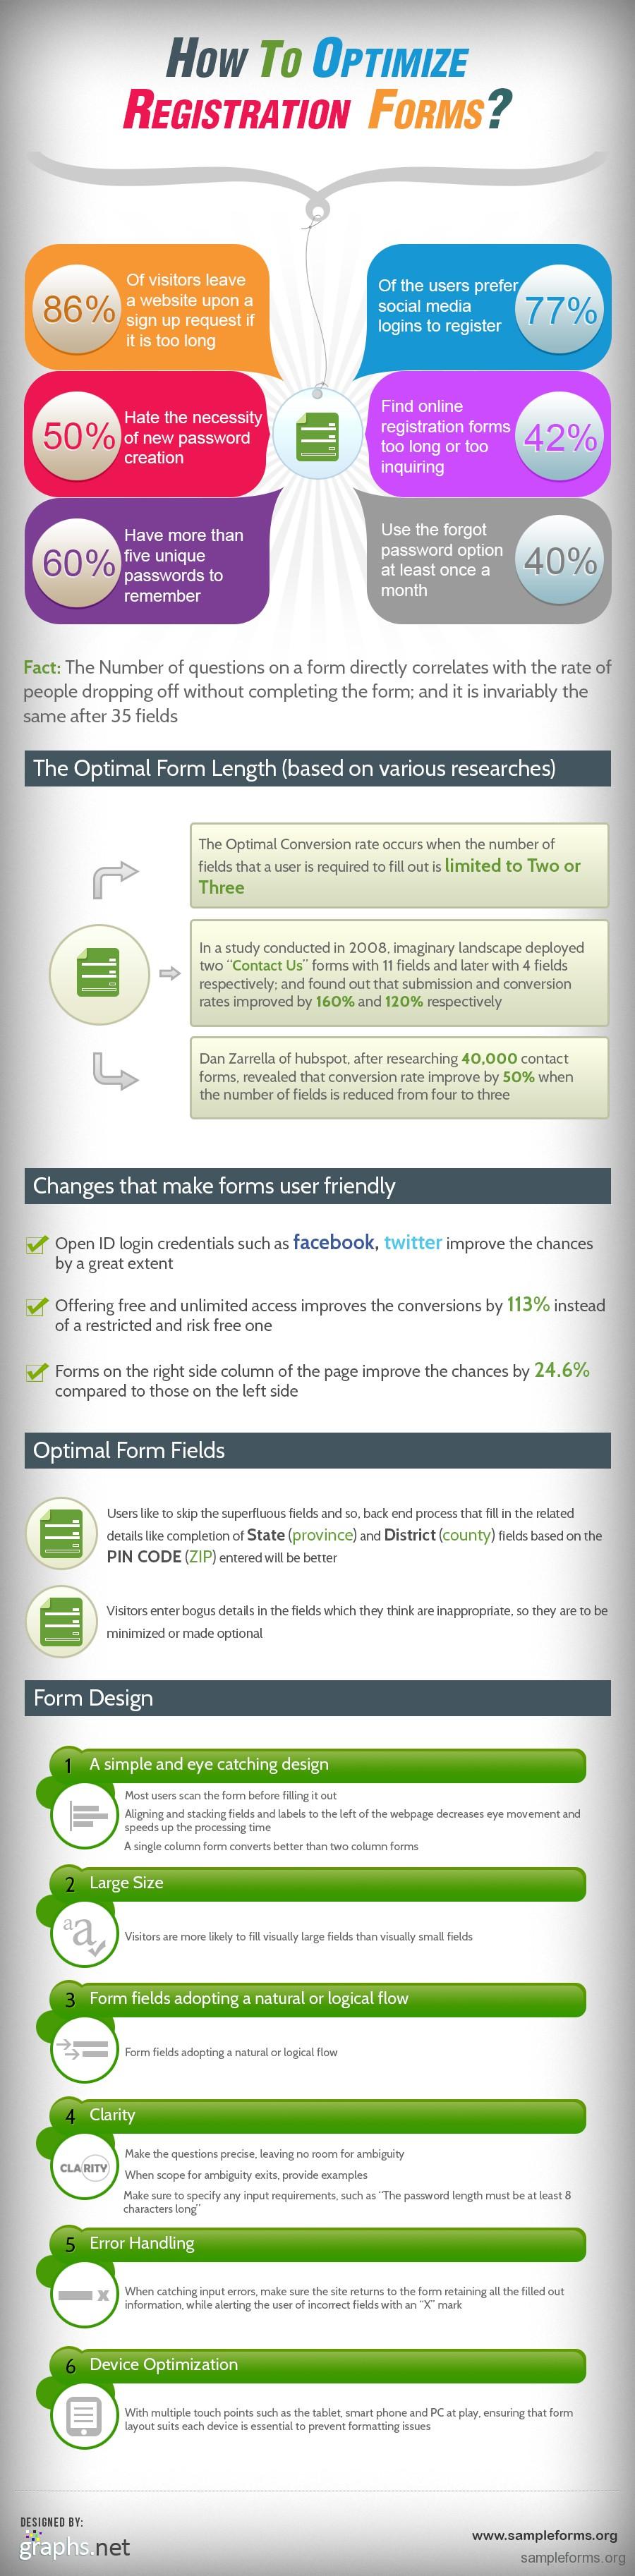 Tips to Optimize Online Registration Forms